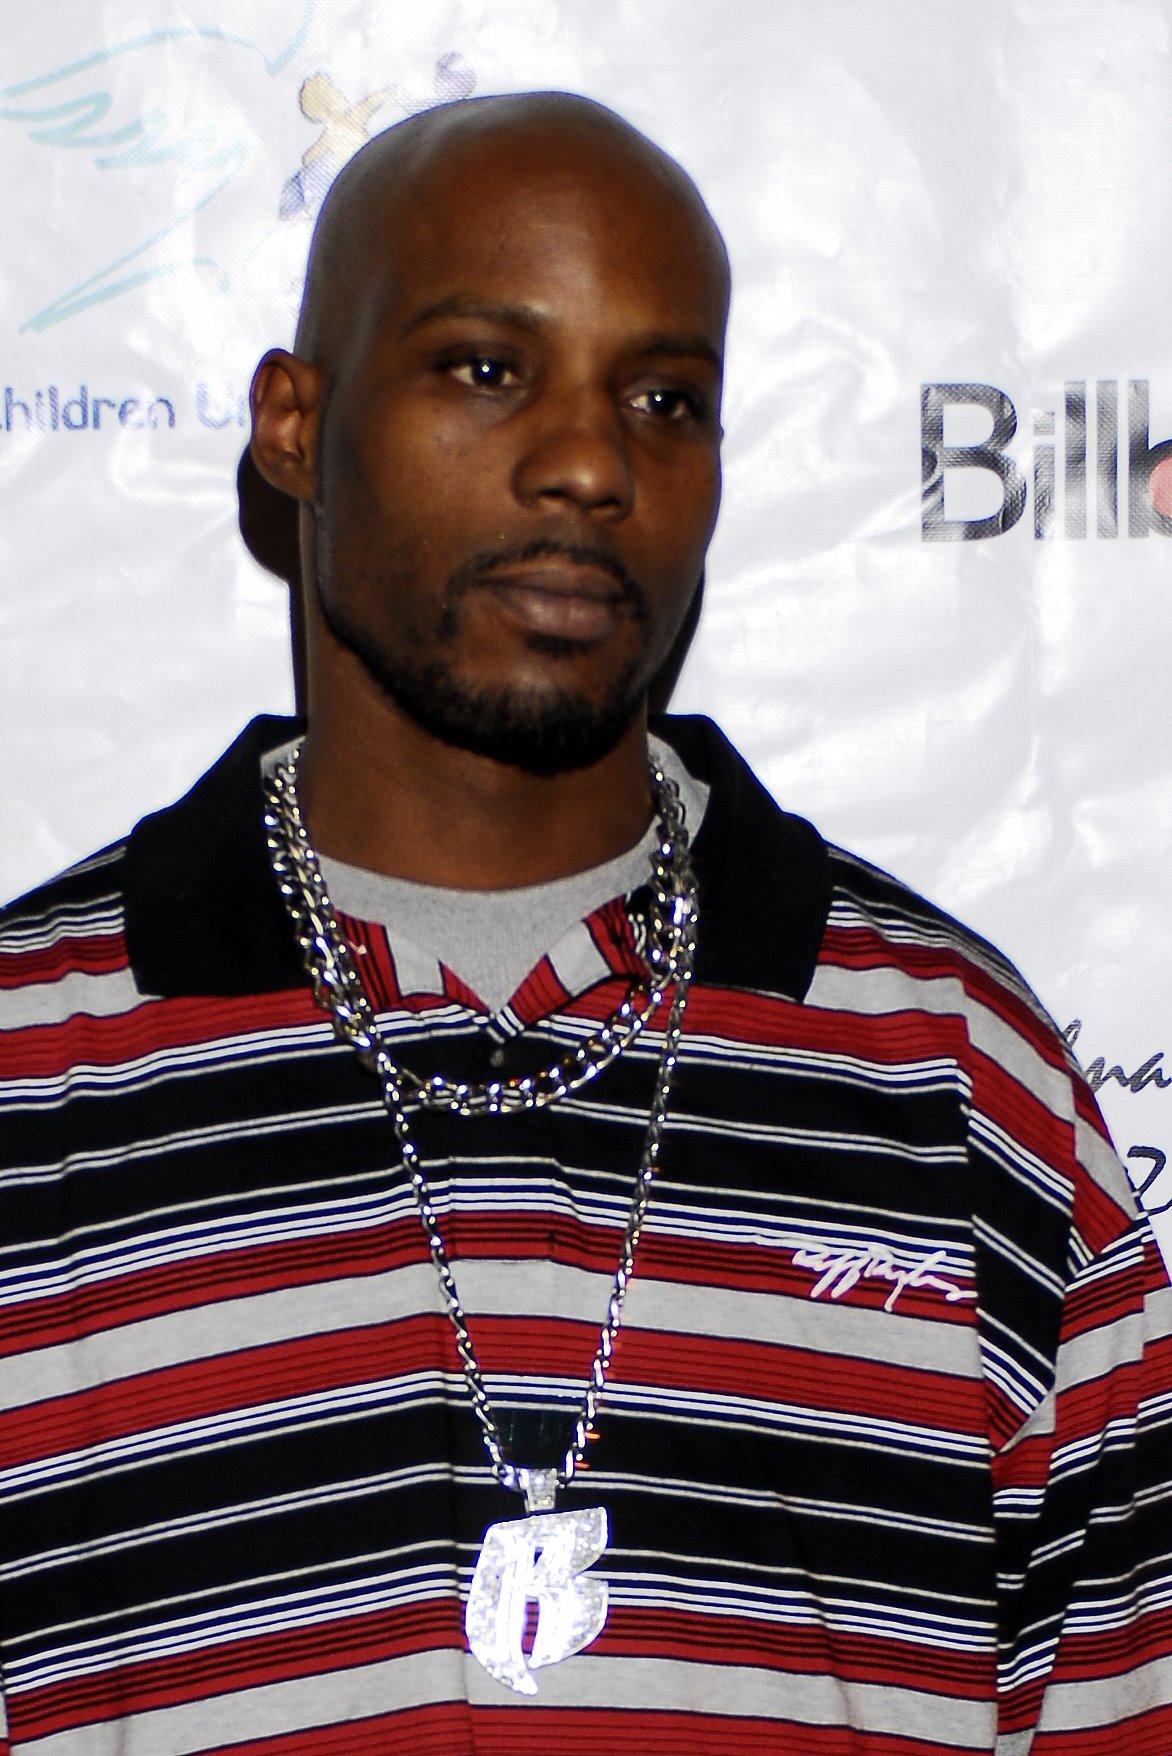 Big Pun Discography : discography, (rapper), Wikipedia